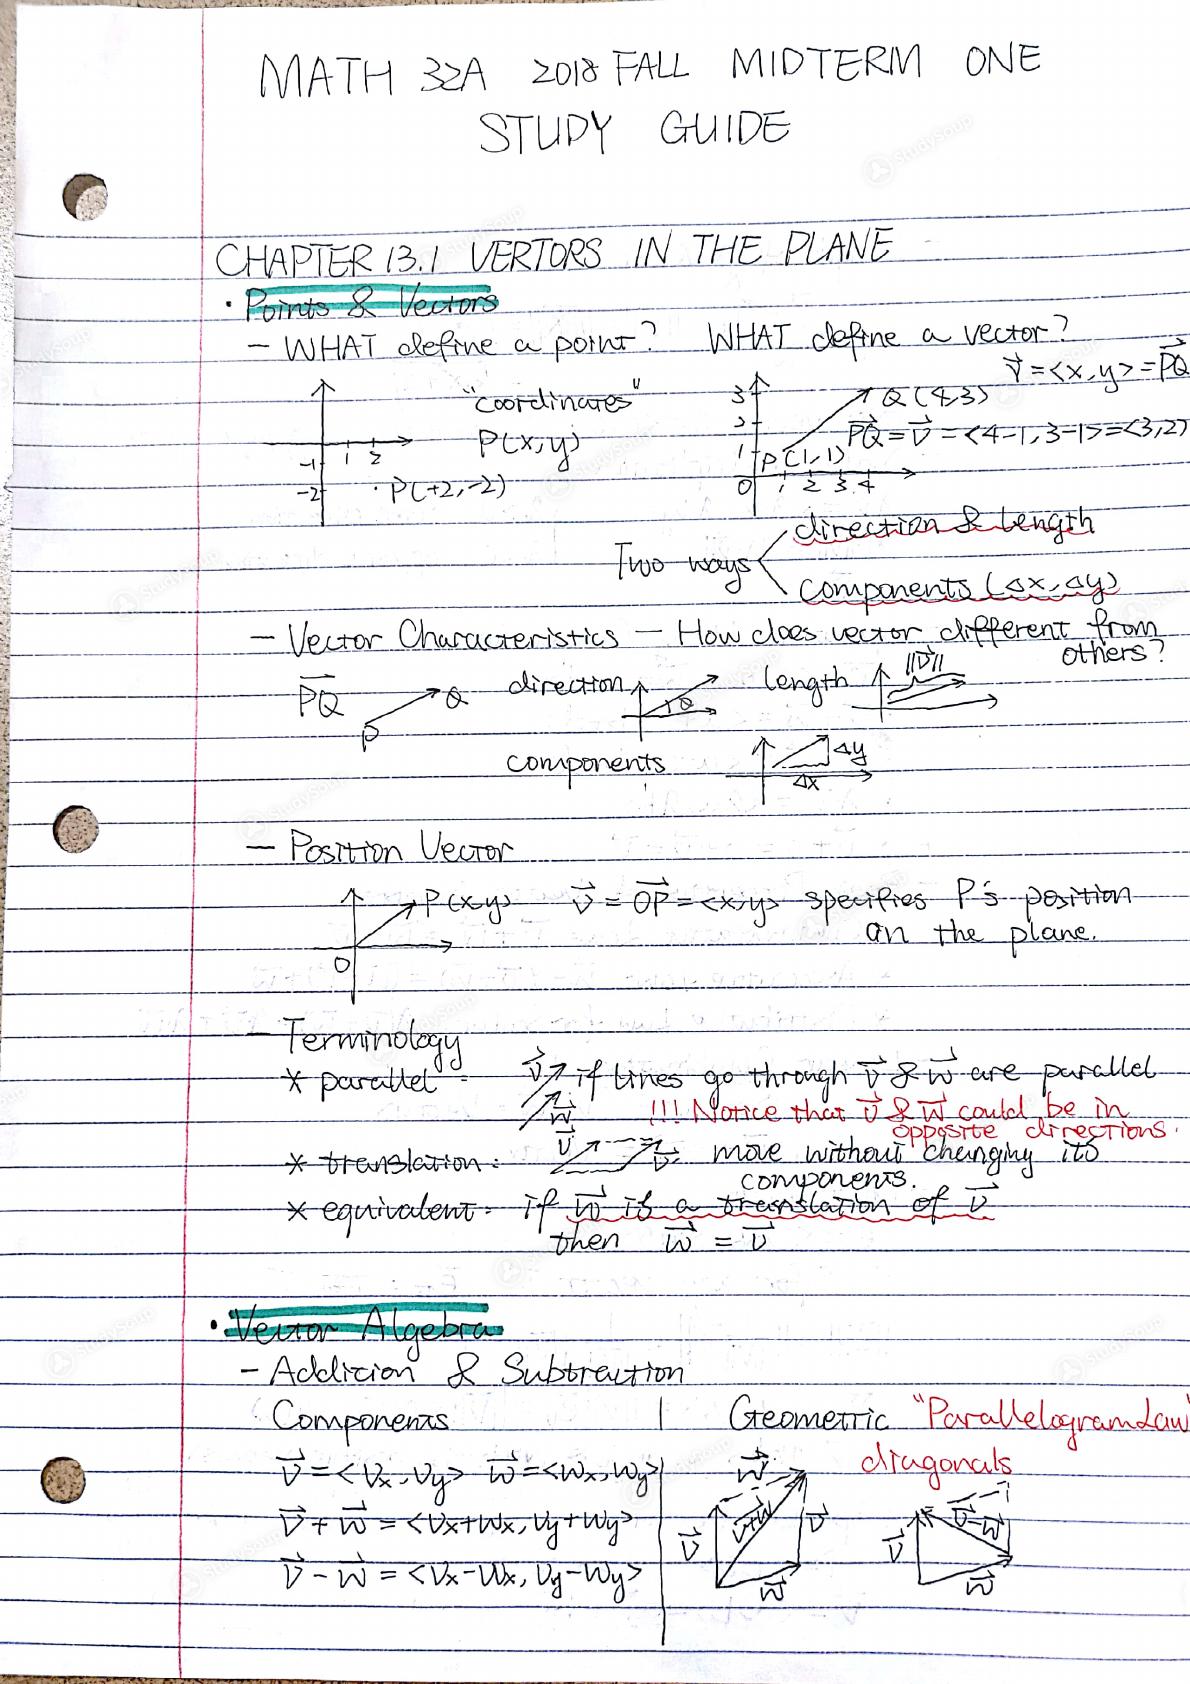 ucla math 32a homework